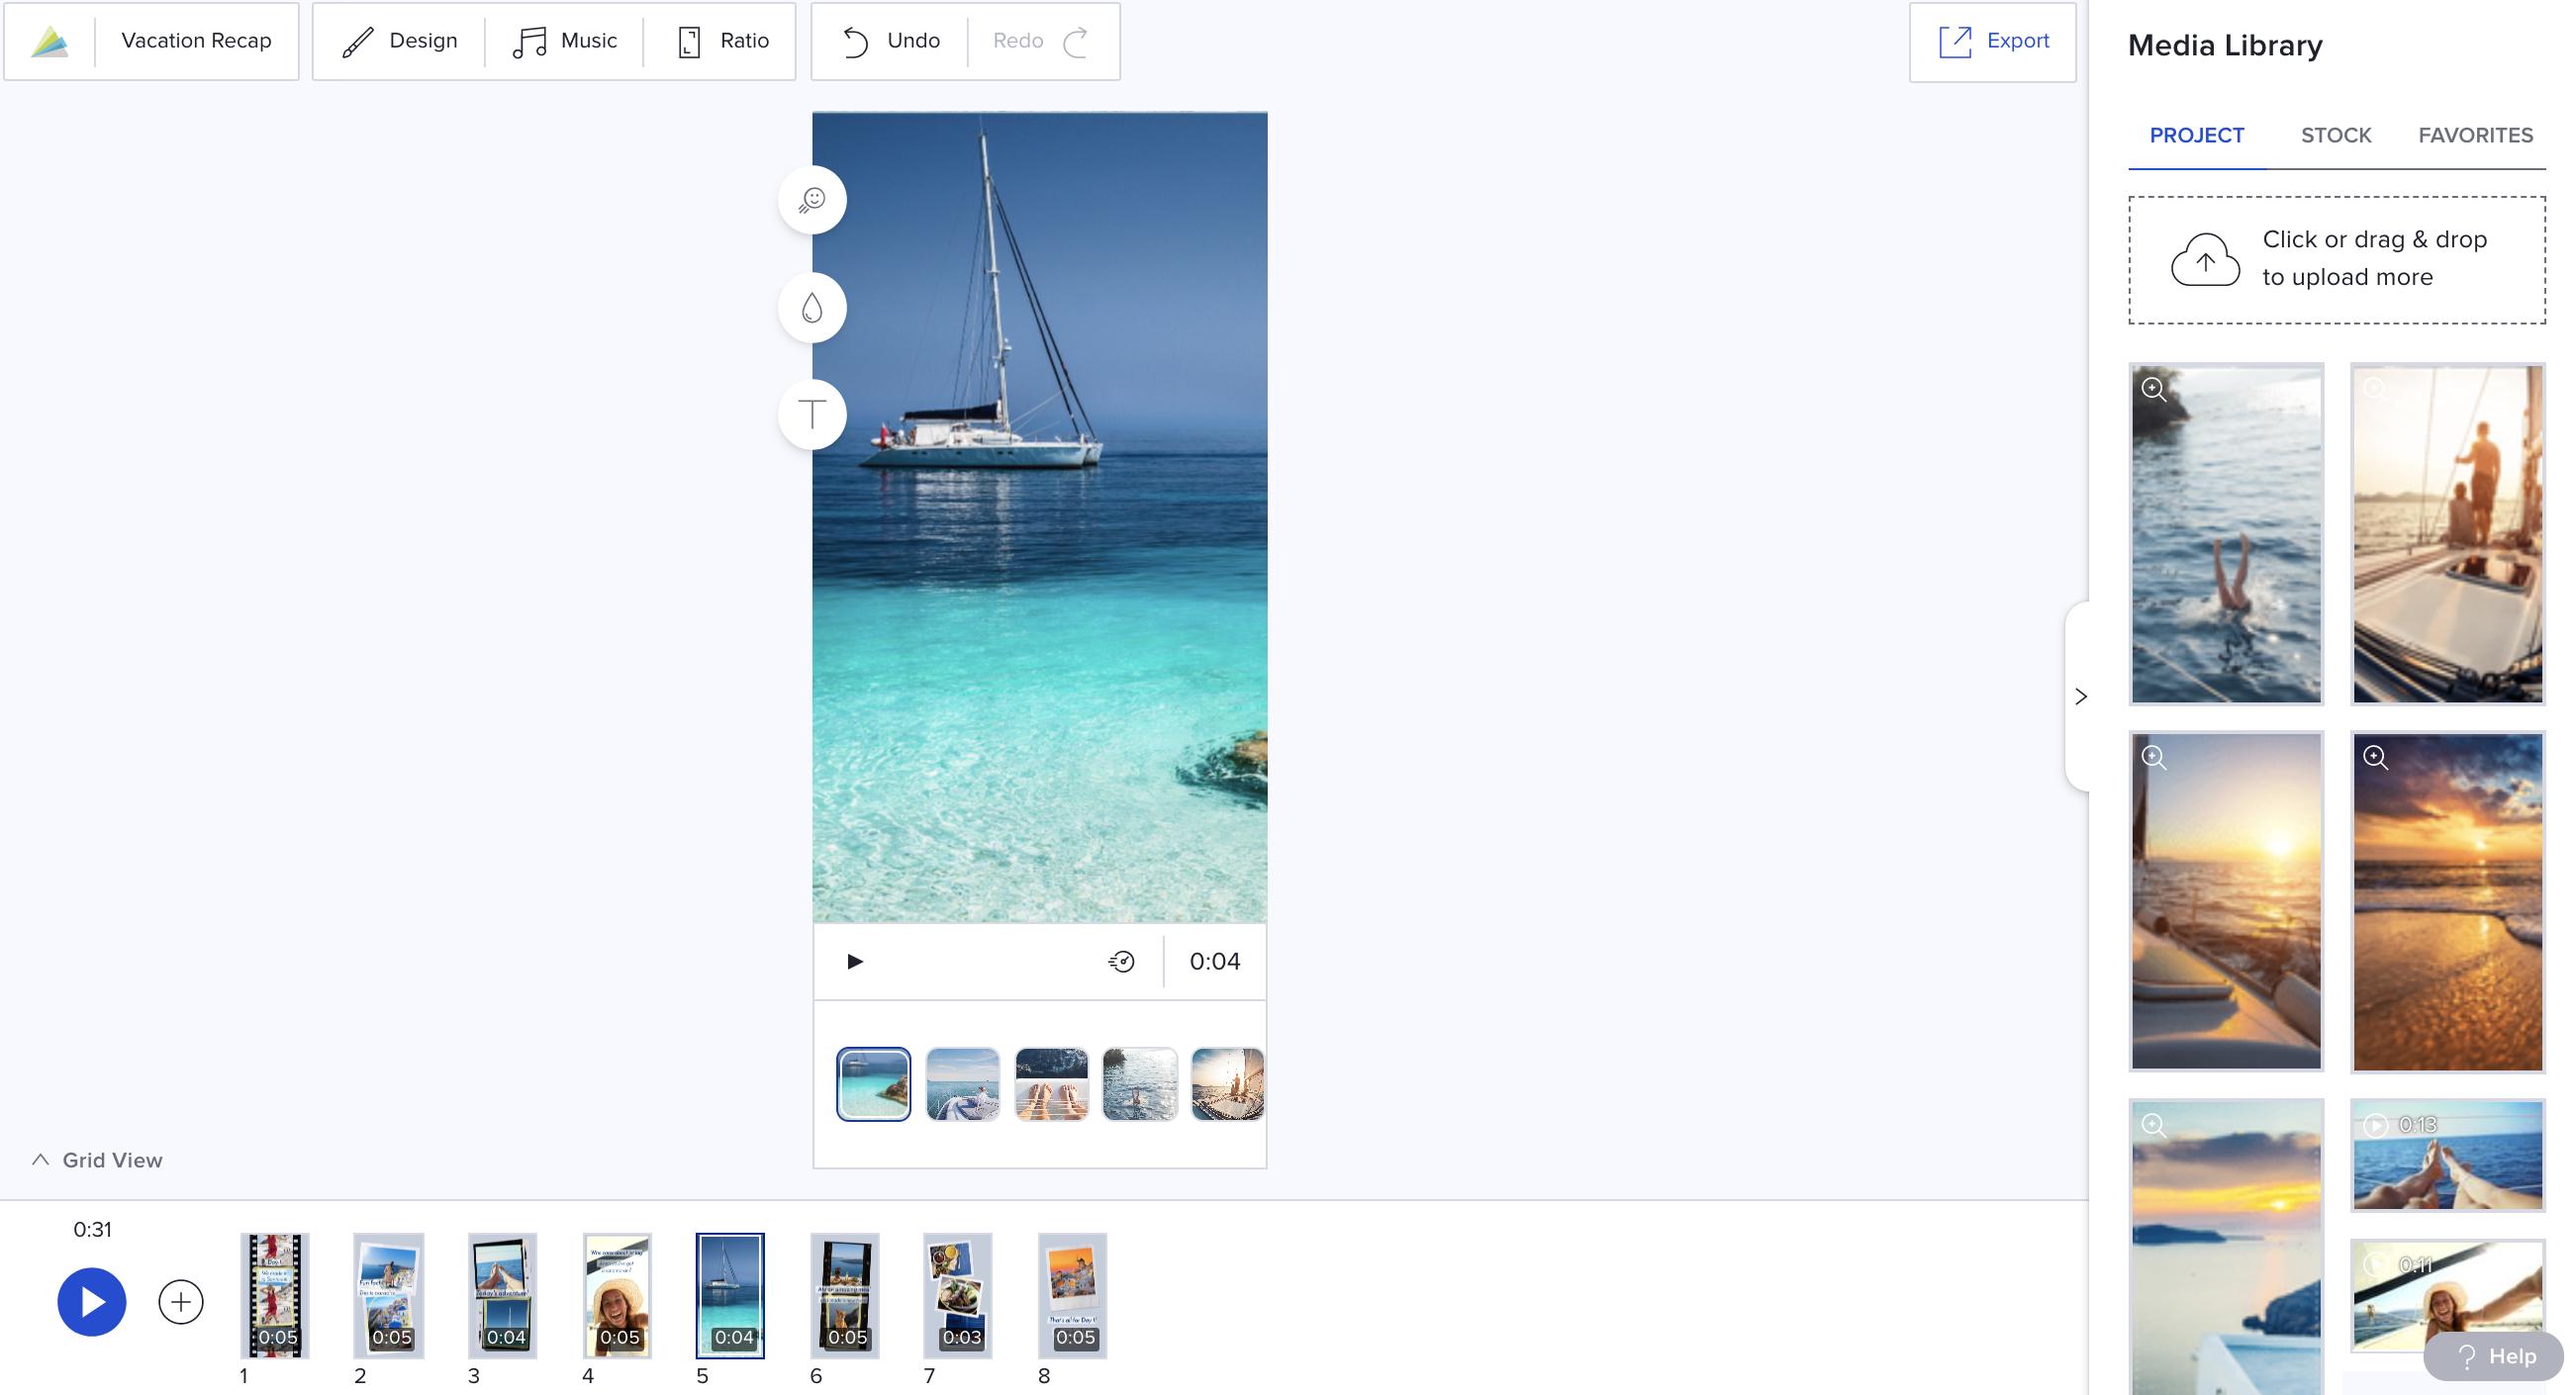 photo-burst-vacation-recap-memories-video